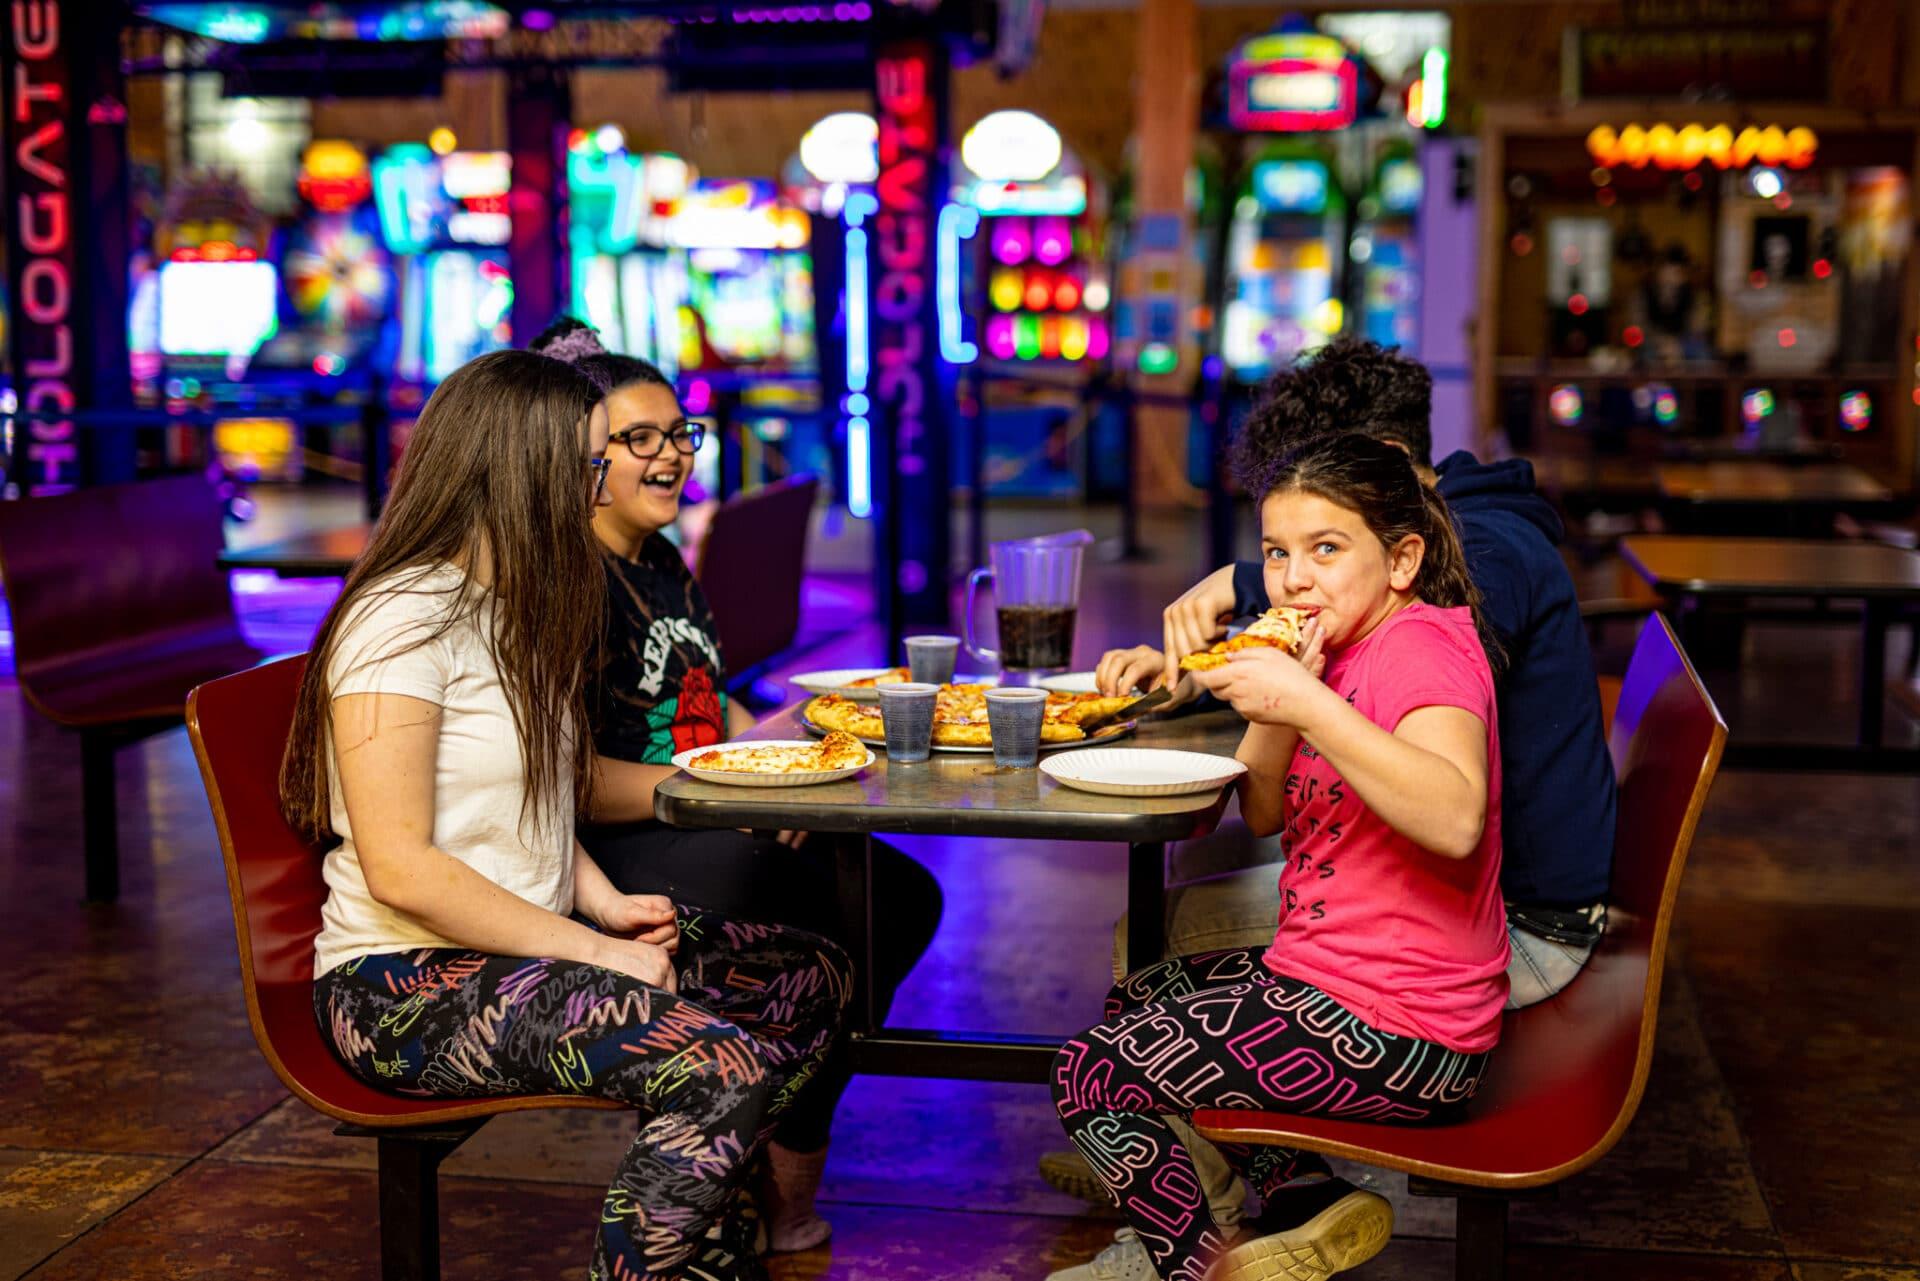 kenosha arcade, action territory, family fun in kenosha